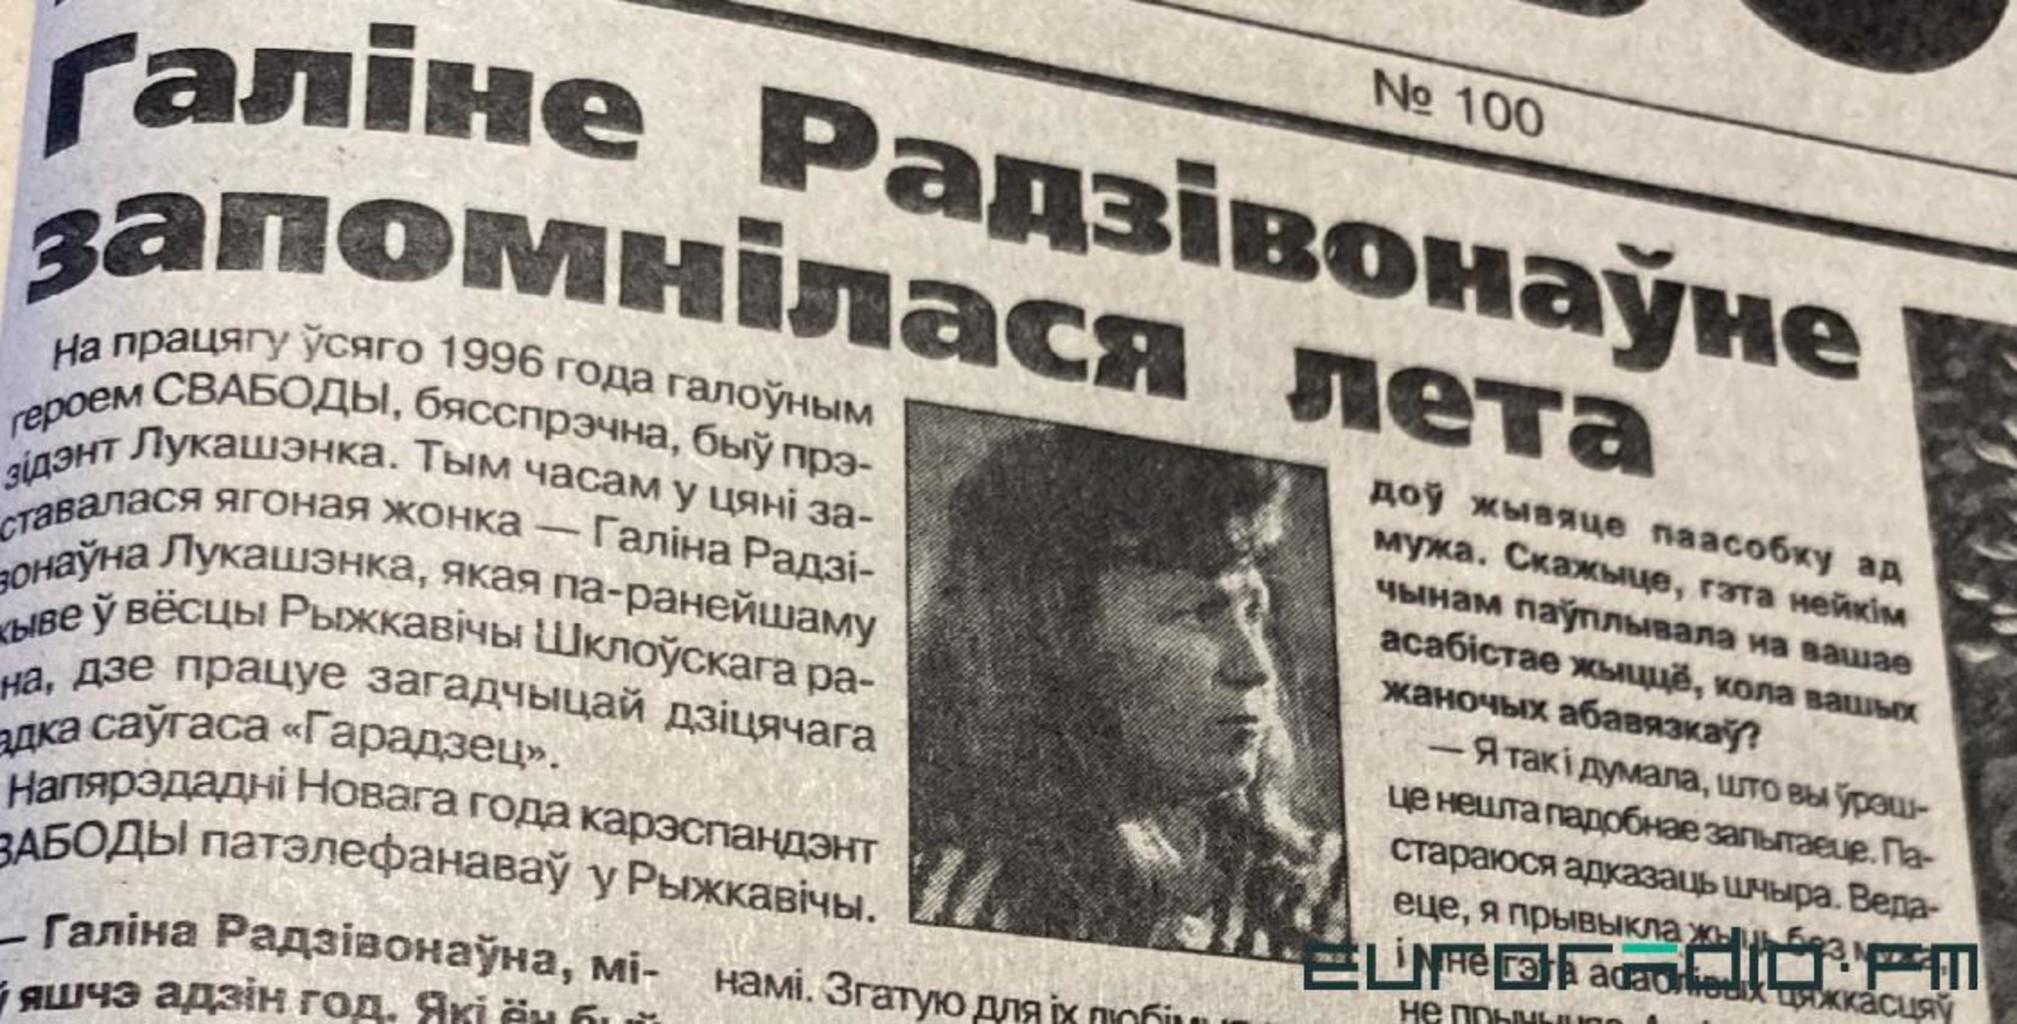 Gazeta 19 06 2 0